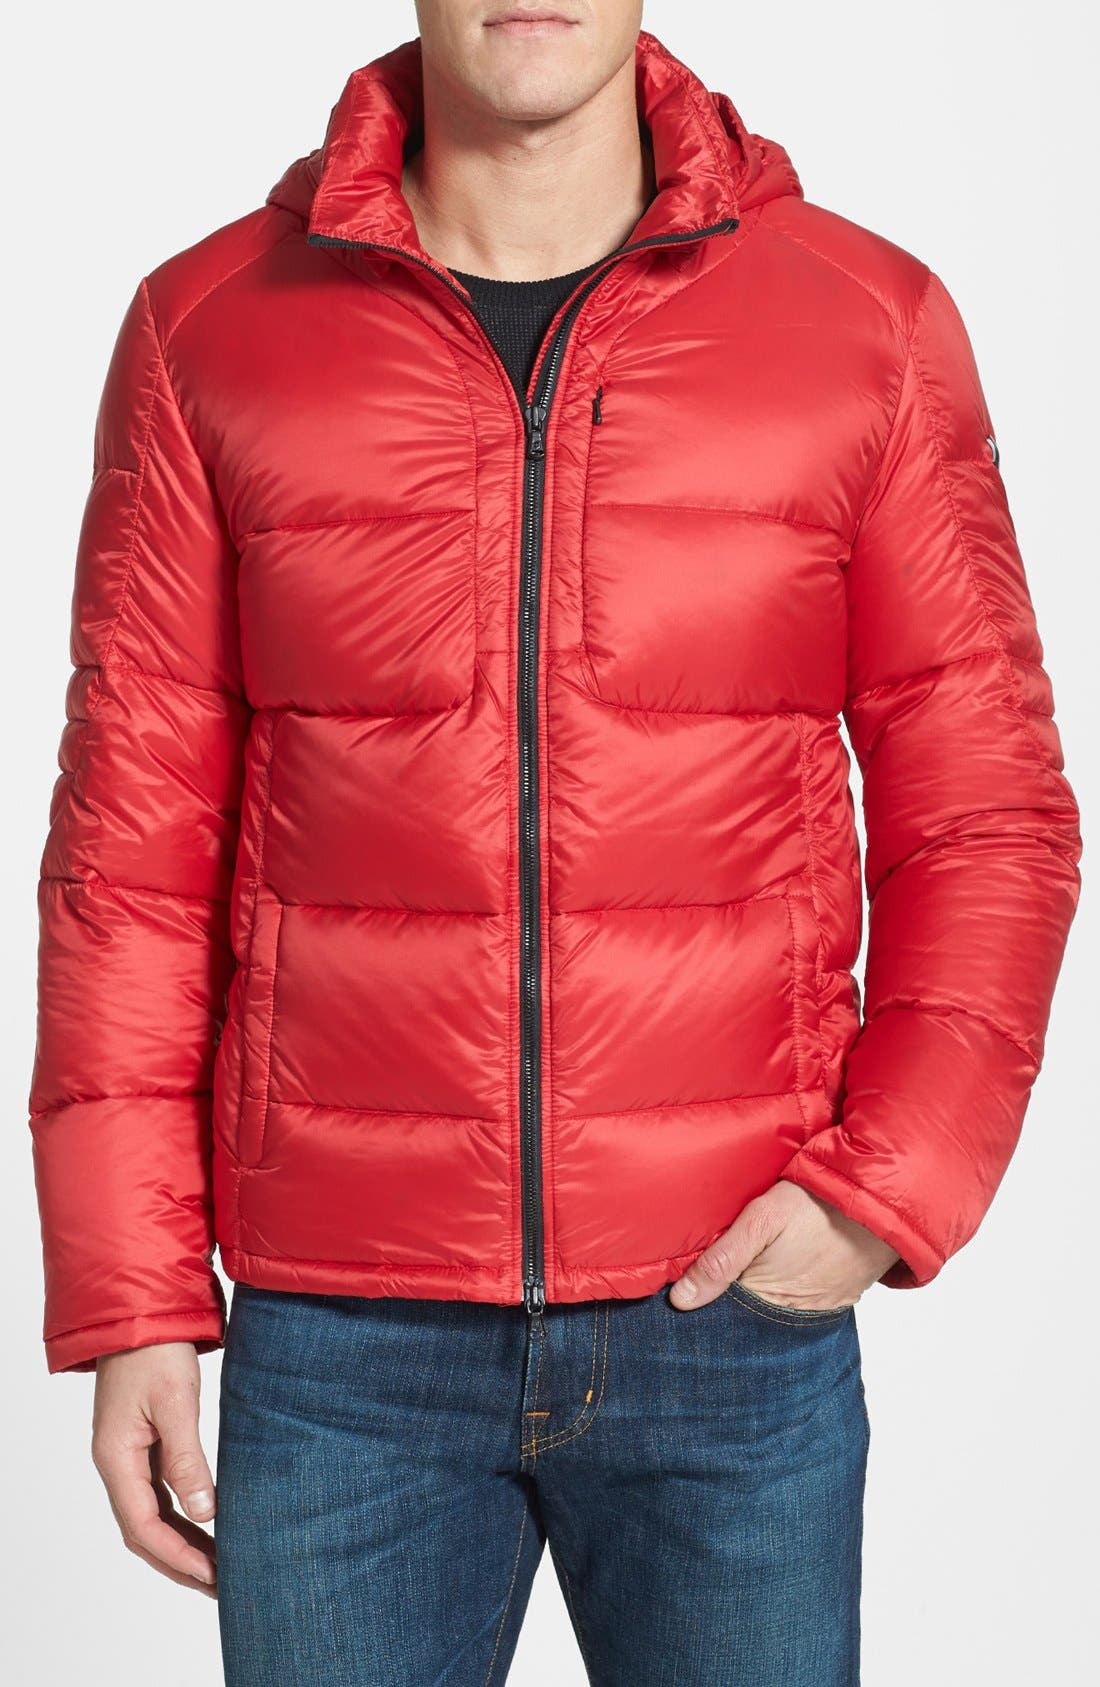 Alternate Image 1 Selected - Victorinox Swiss Army® 'Davos' Down Jacket